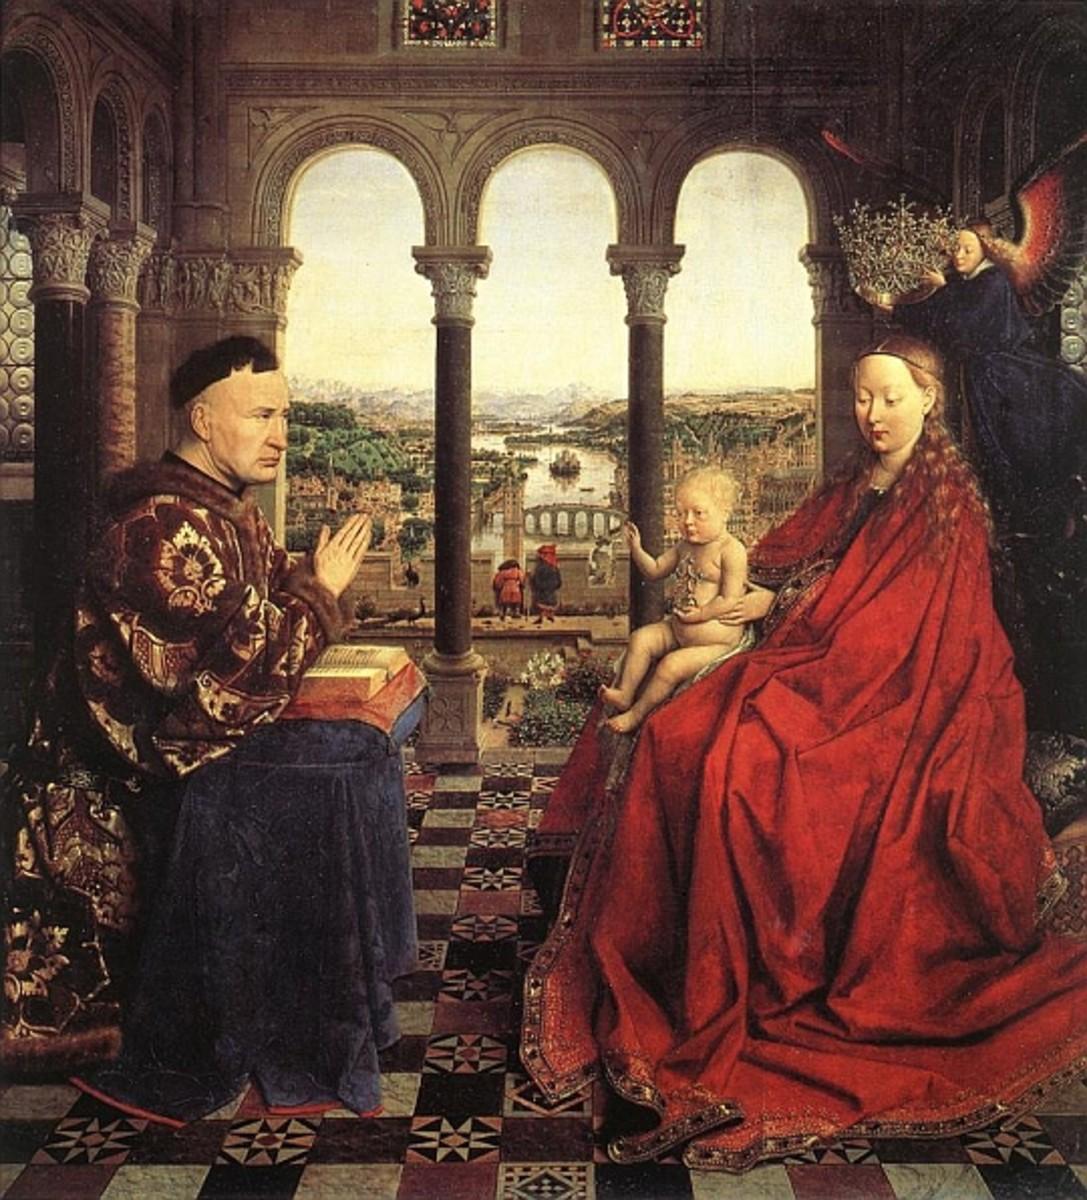 Legendary Works of Famous Italian Renaissance Artists